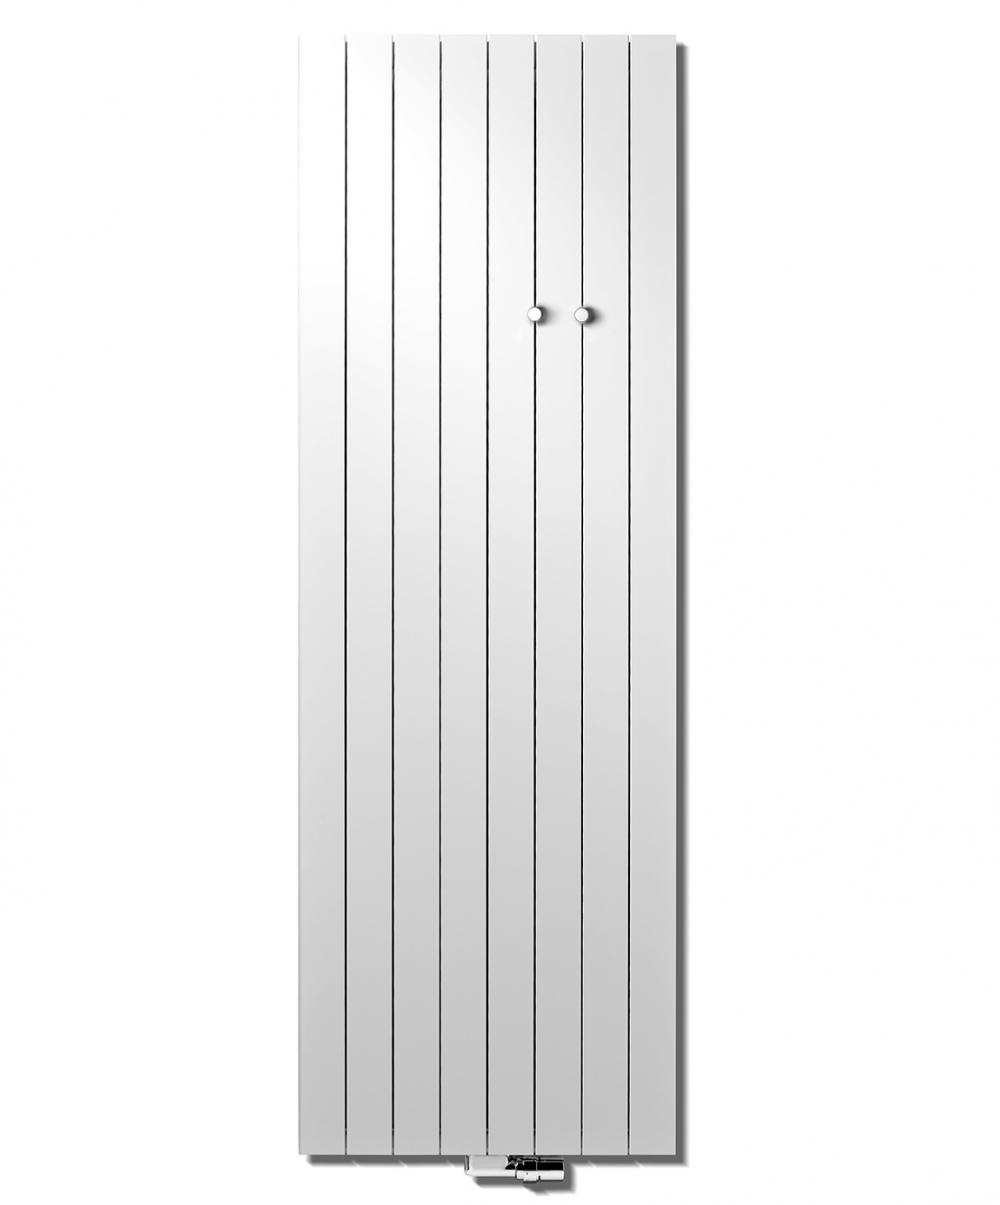 Calorifere verticale aluminiu Vasco Zaros V75 2200x450 mm, 1765 W